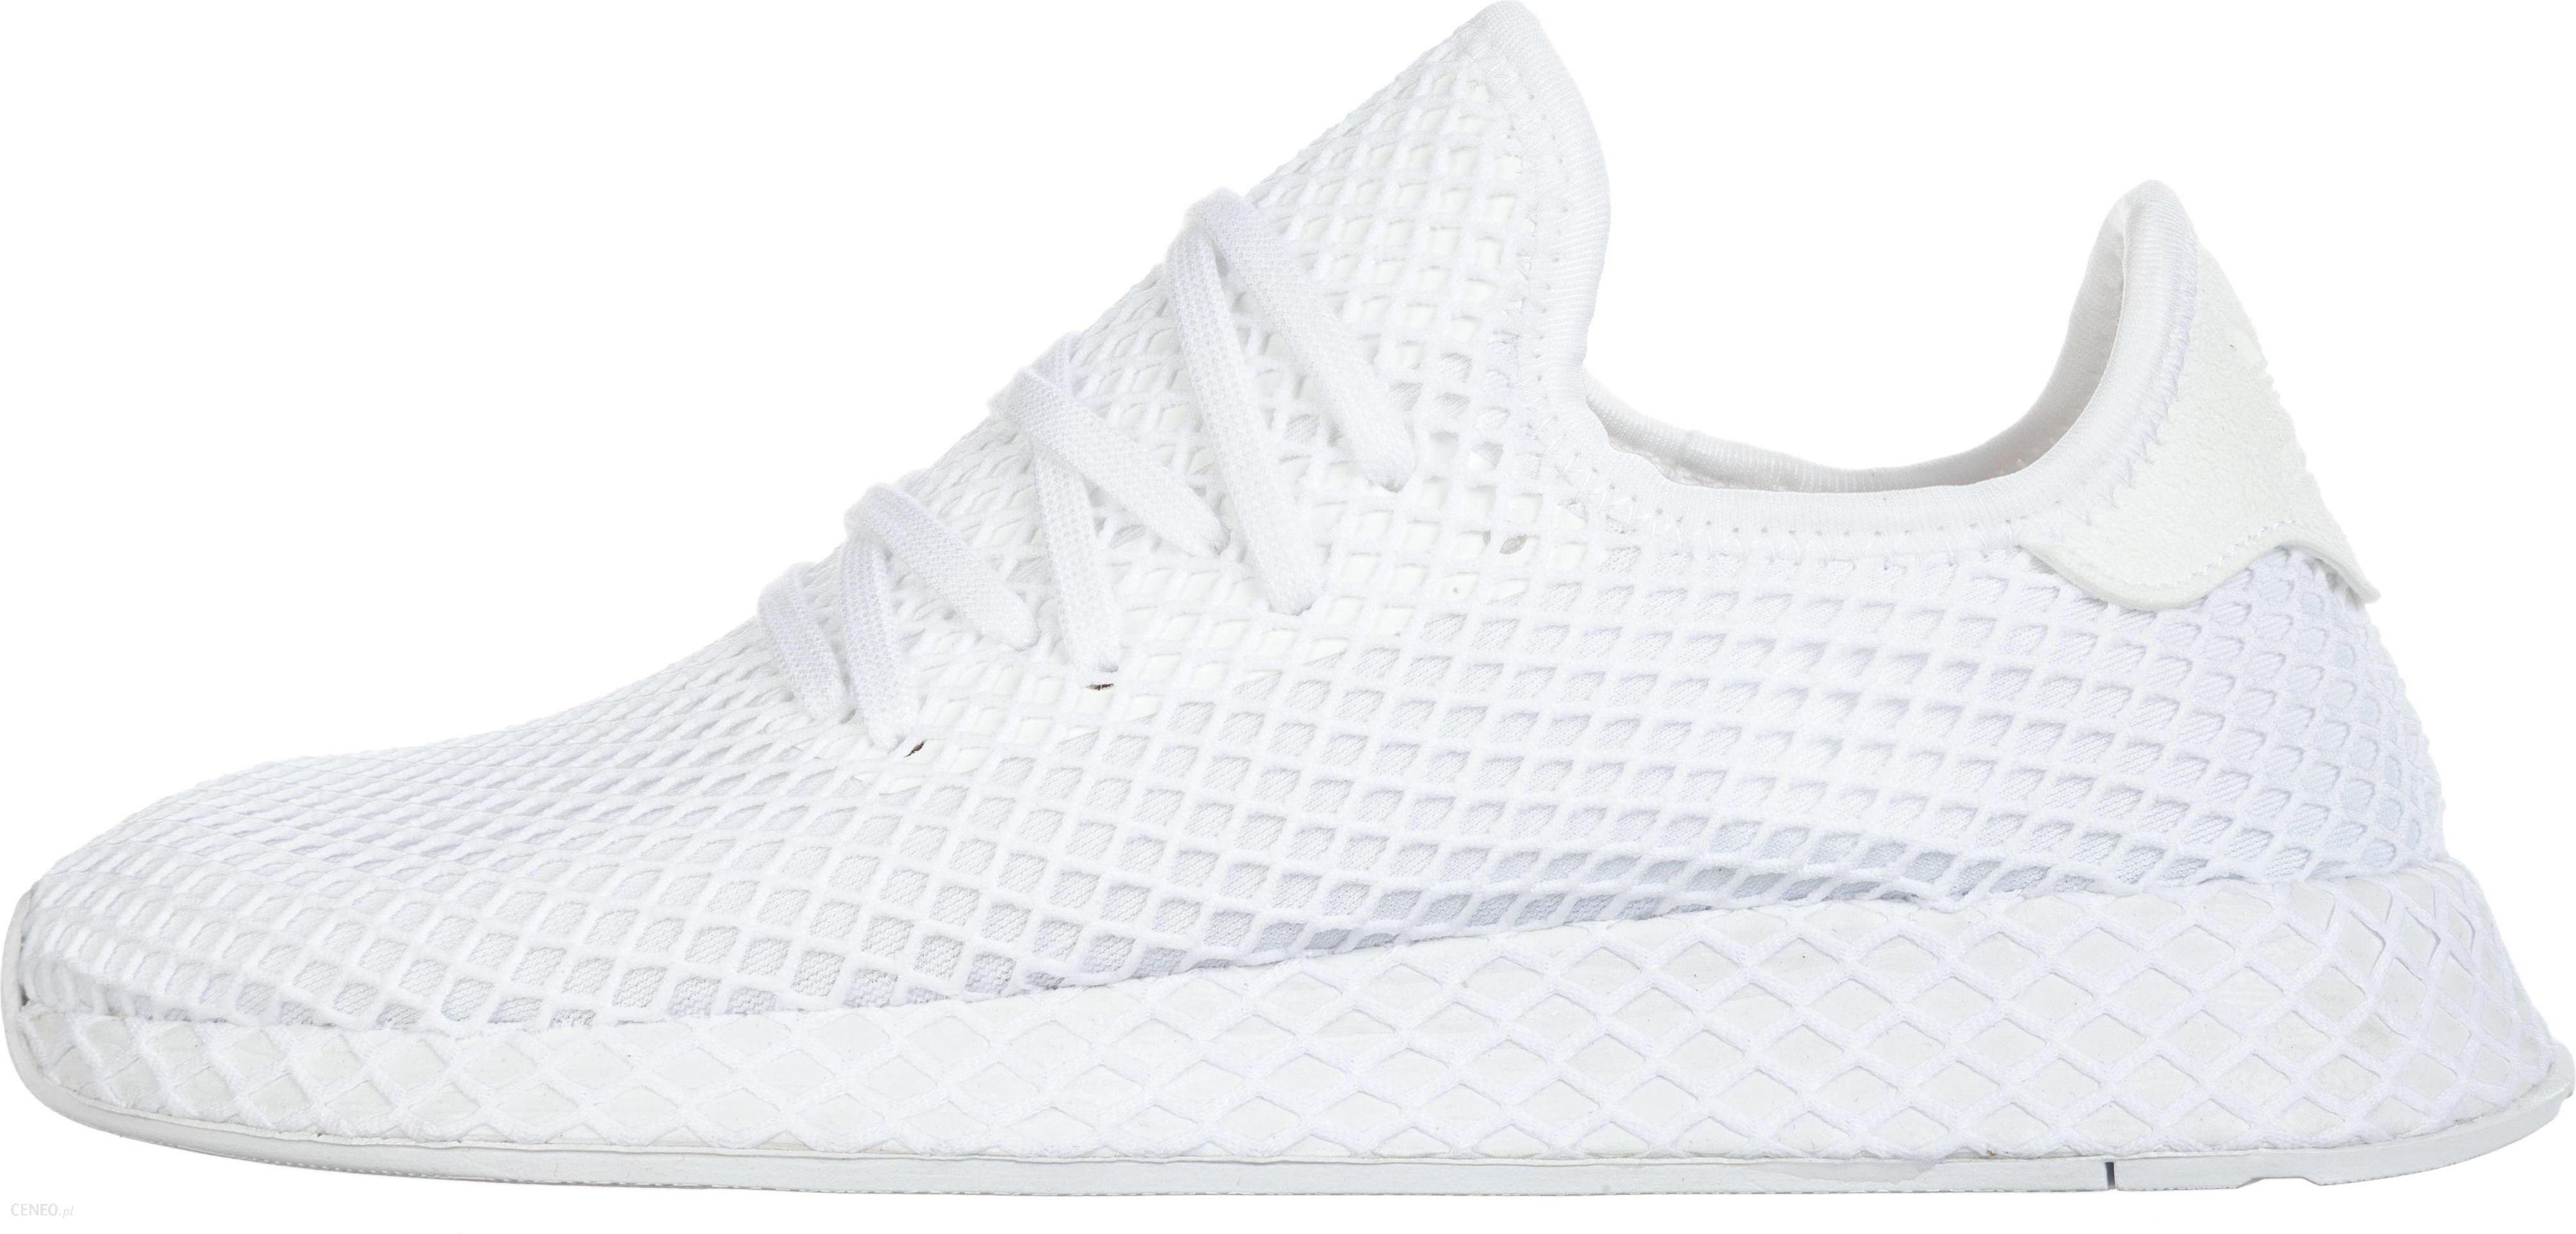 new arrival a83e2 89f12 adidas Originals Deerupt Runner Tenisówki Biały 41 1 3 - zdjęcie 1